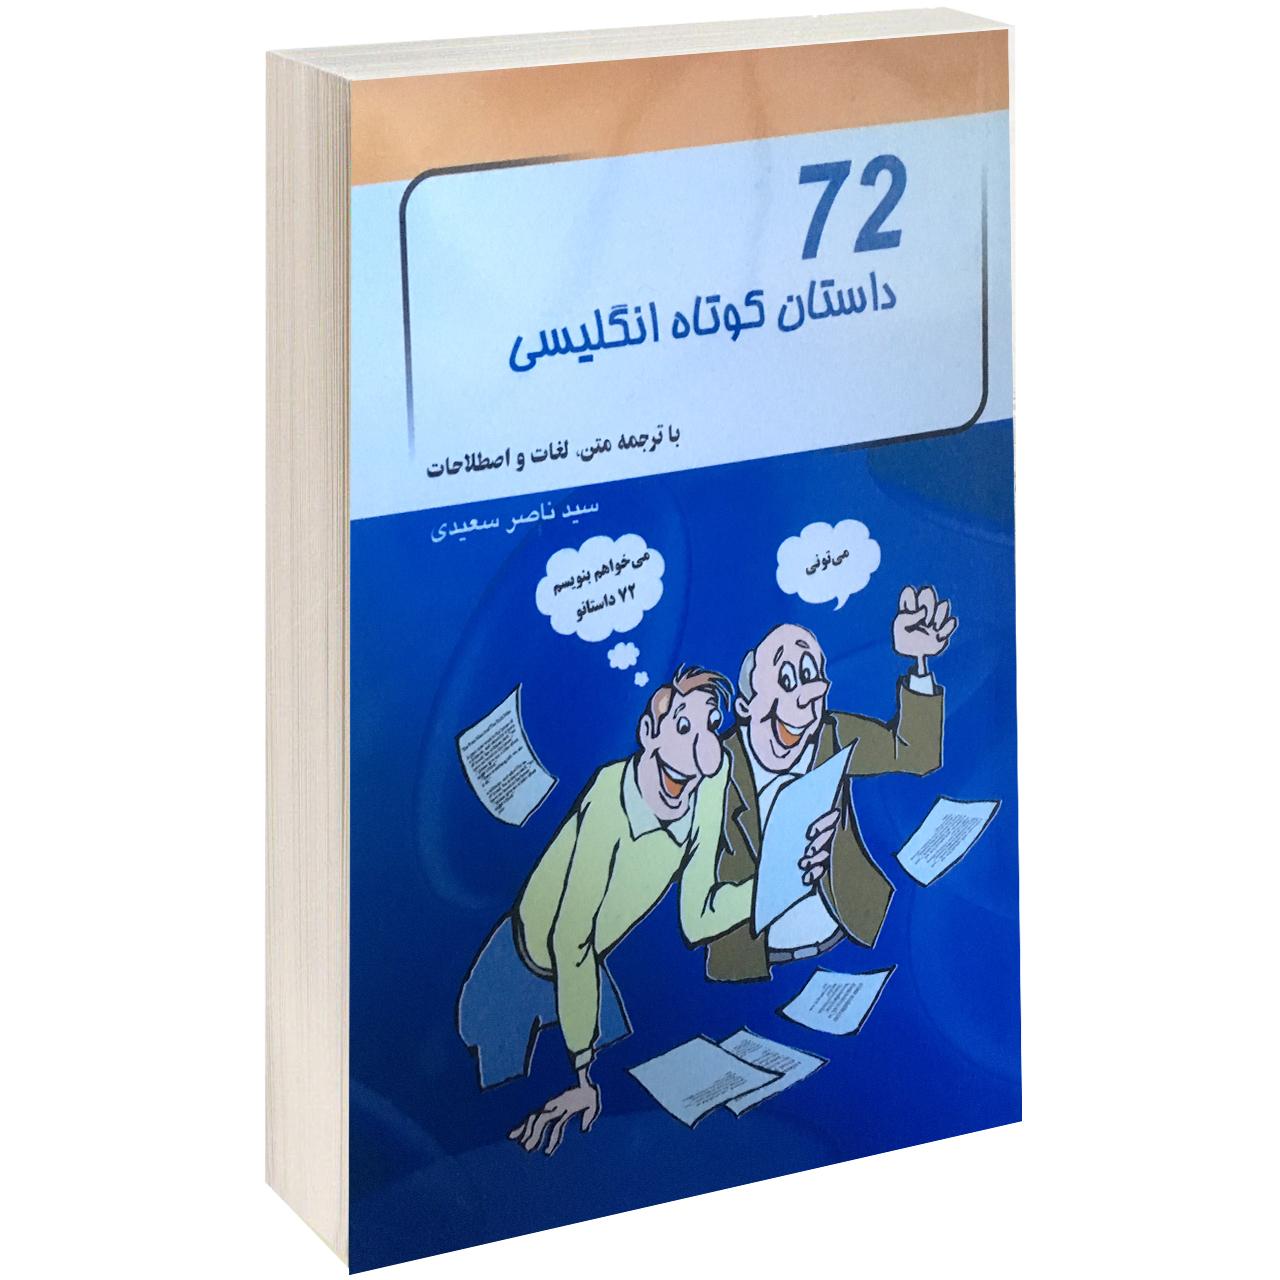 خرید                      کتاب 72 داستان کوتاه انگلیسی اثر ناصر سعیدی نشر پرتو خورشید